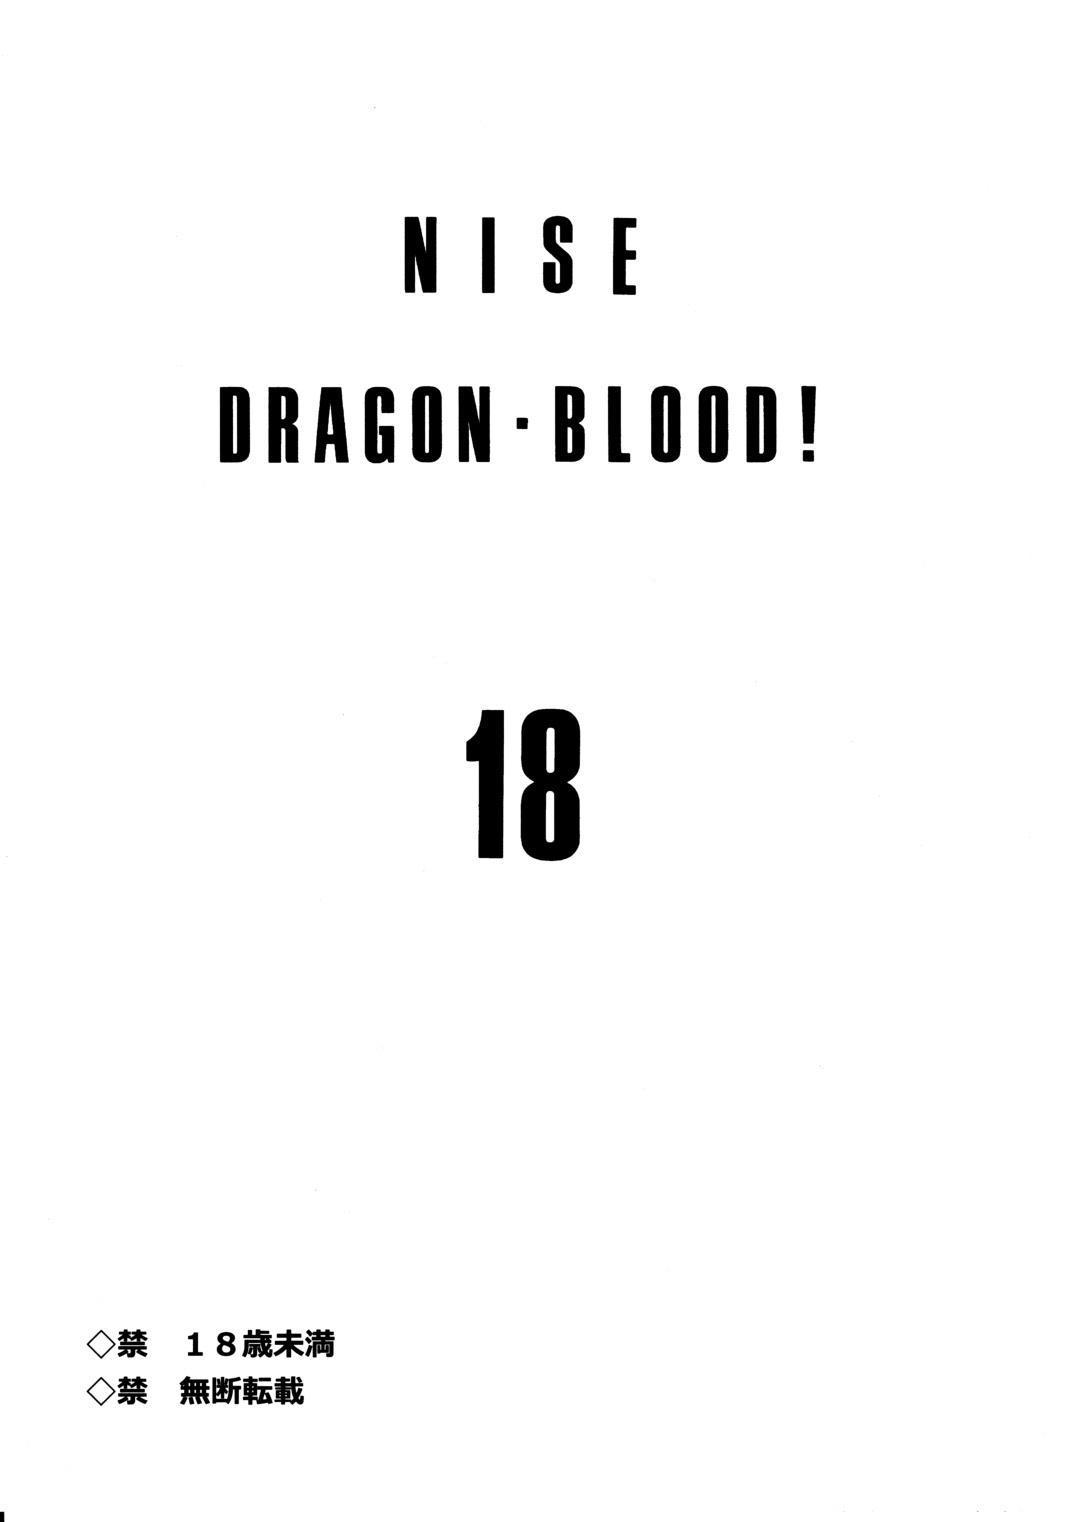 Nise Dragon Blood! 18 2